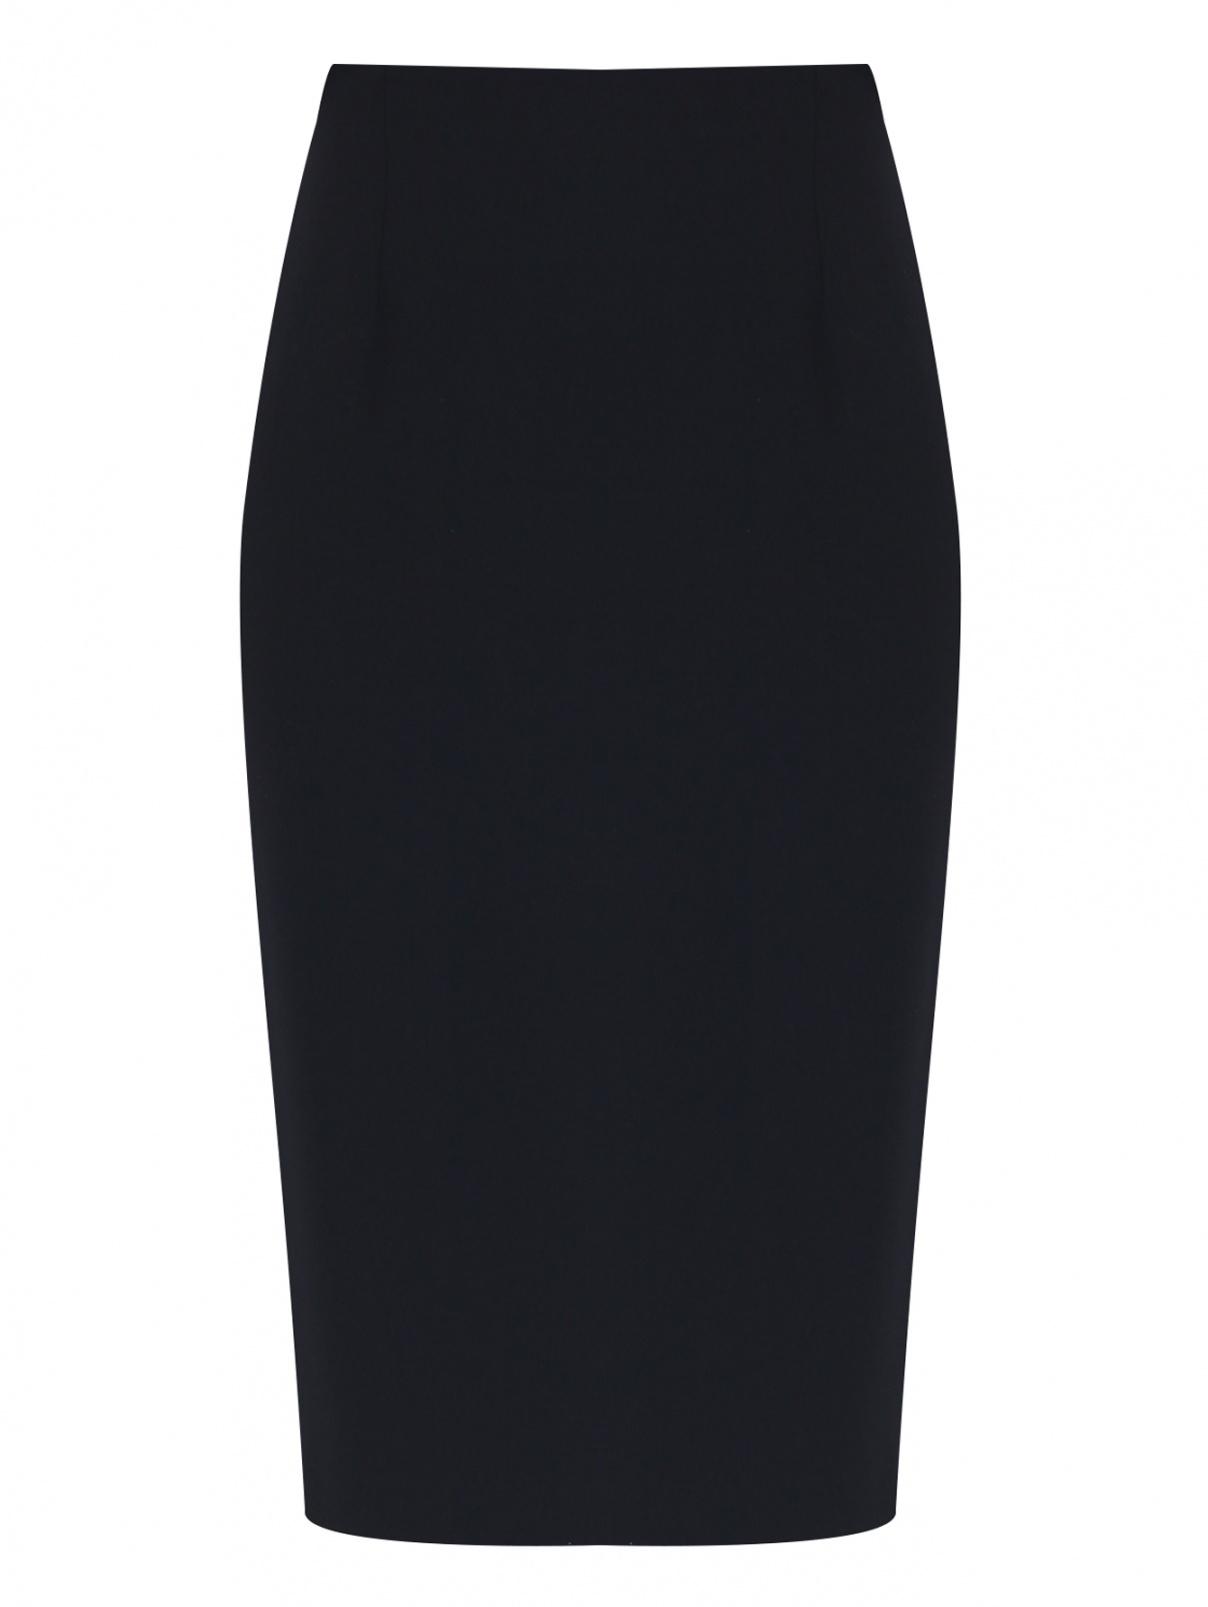 Однотонная юбка карандаш Marina Rinaldi  –  Общий вид